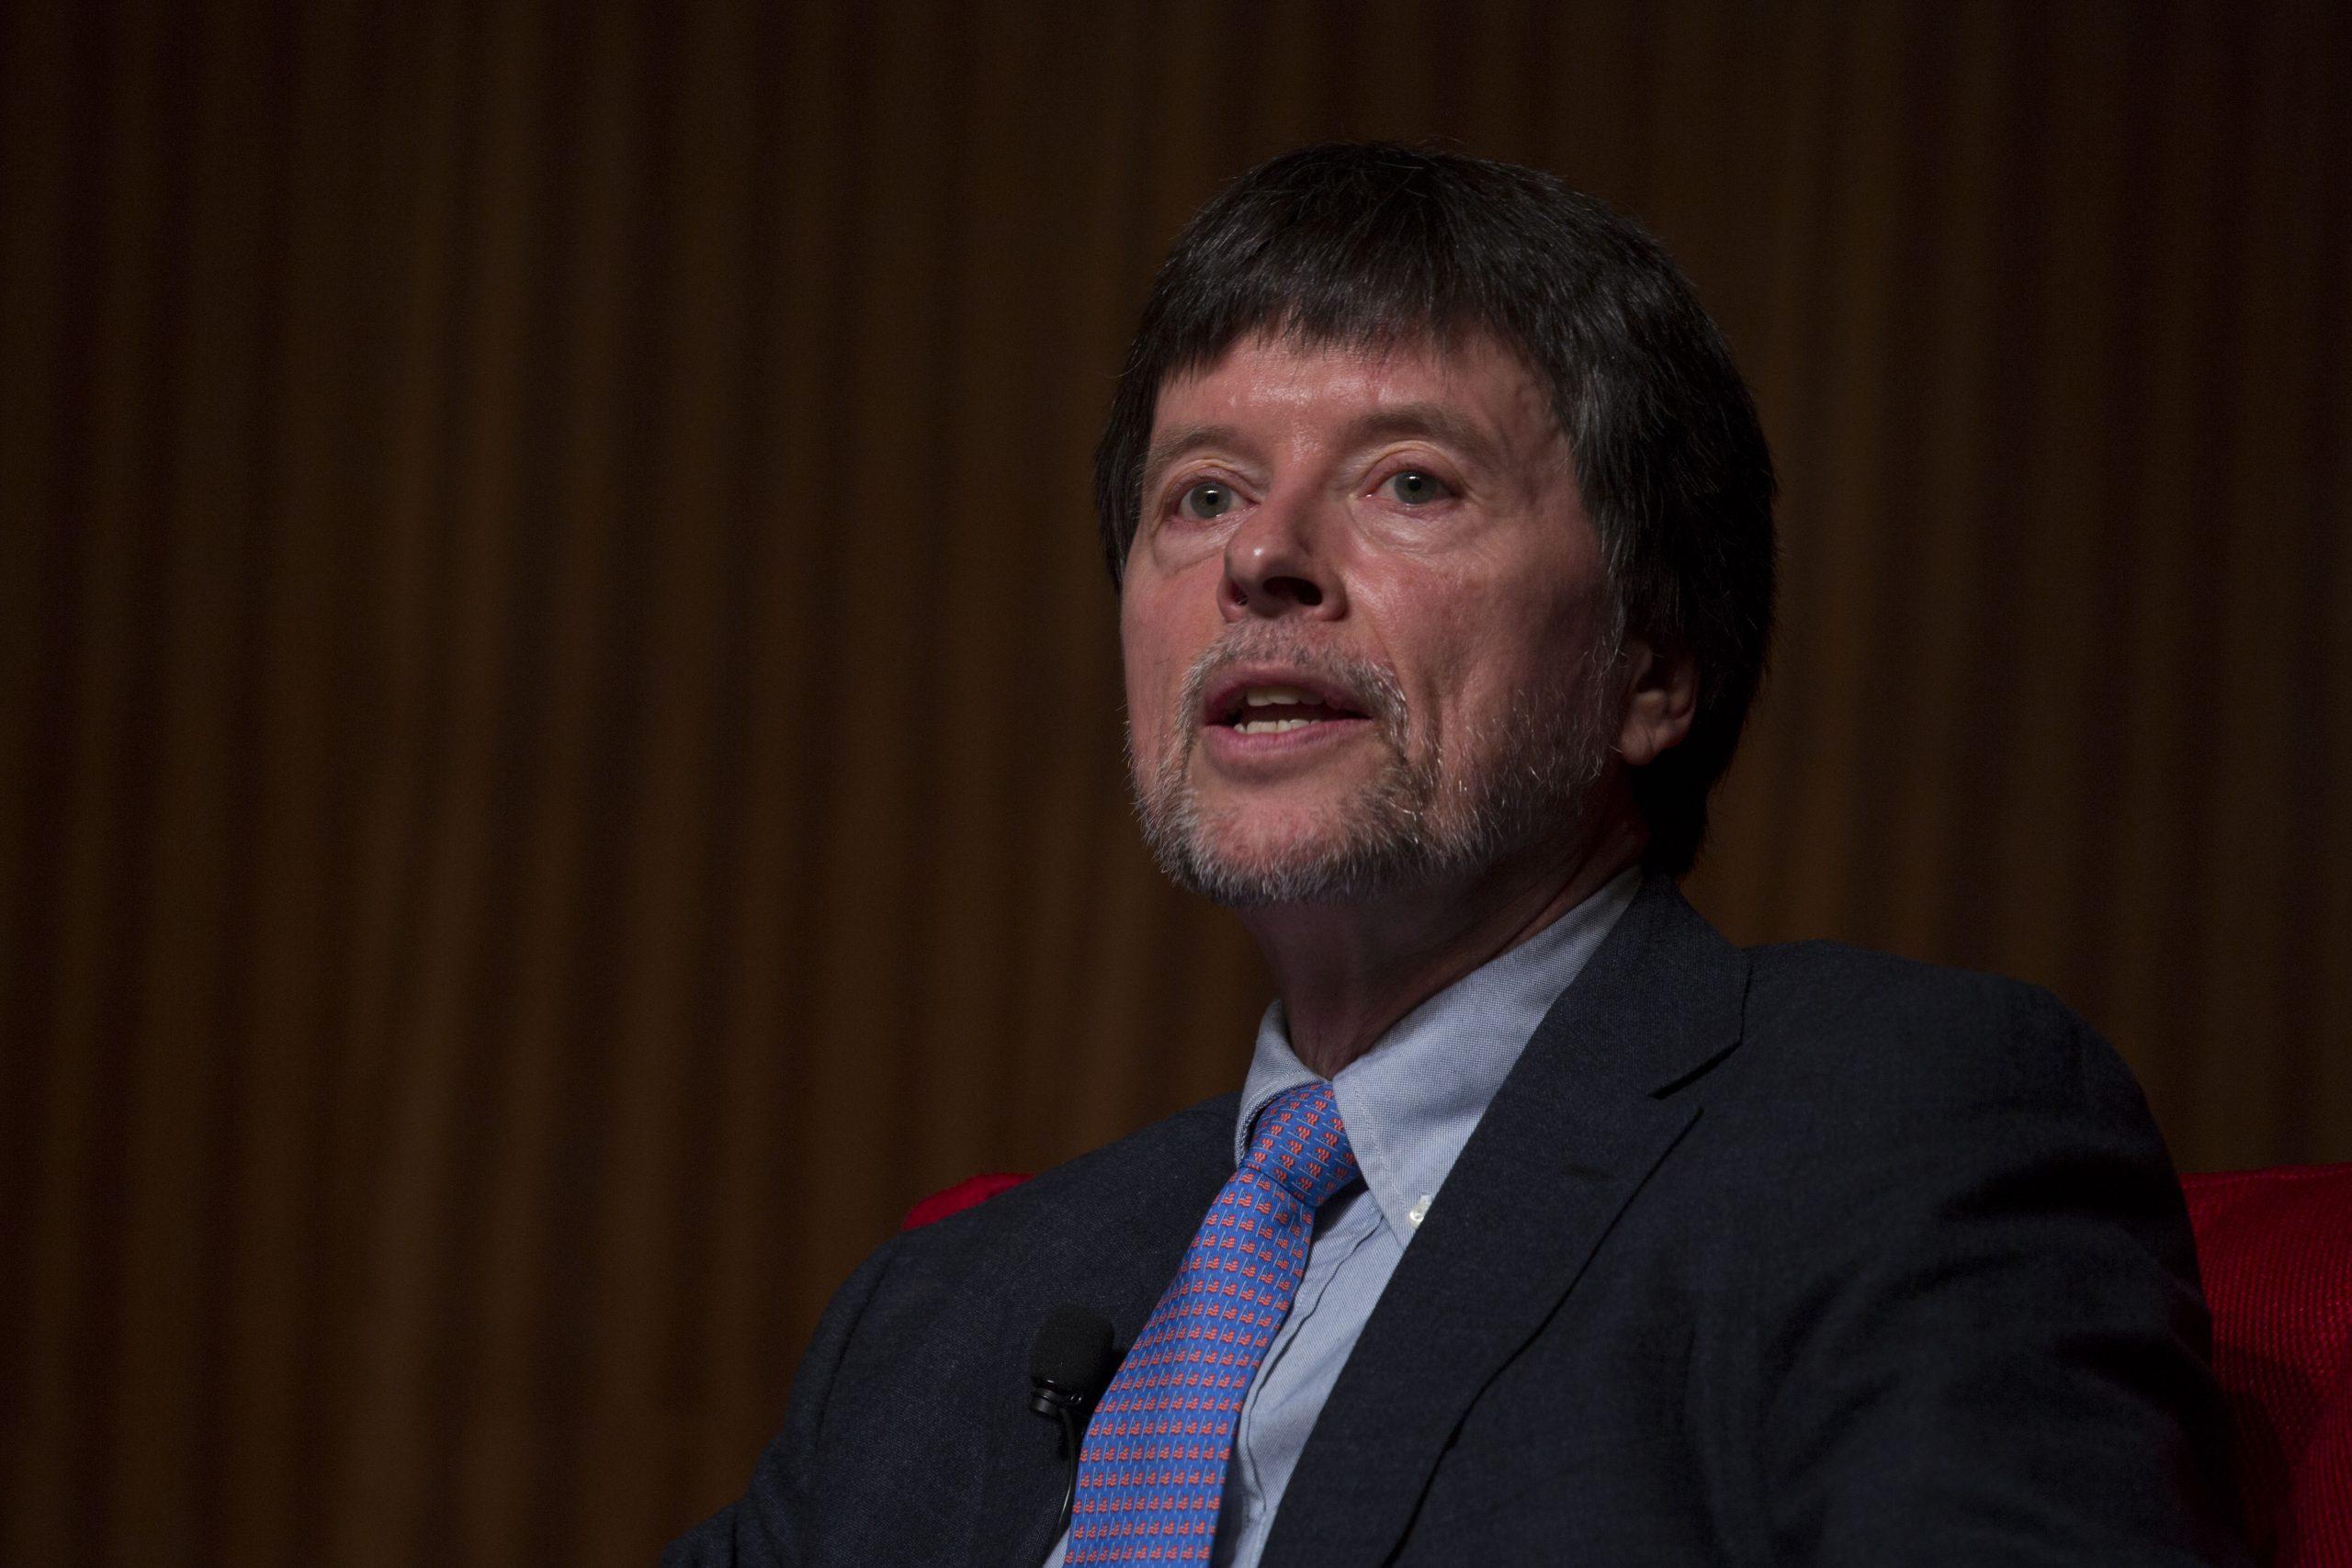 hyperallergic.com: Filmmakers Condemn Lack of Diversity at PBS and Critique Overreliance on Ken Burns